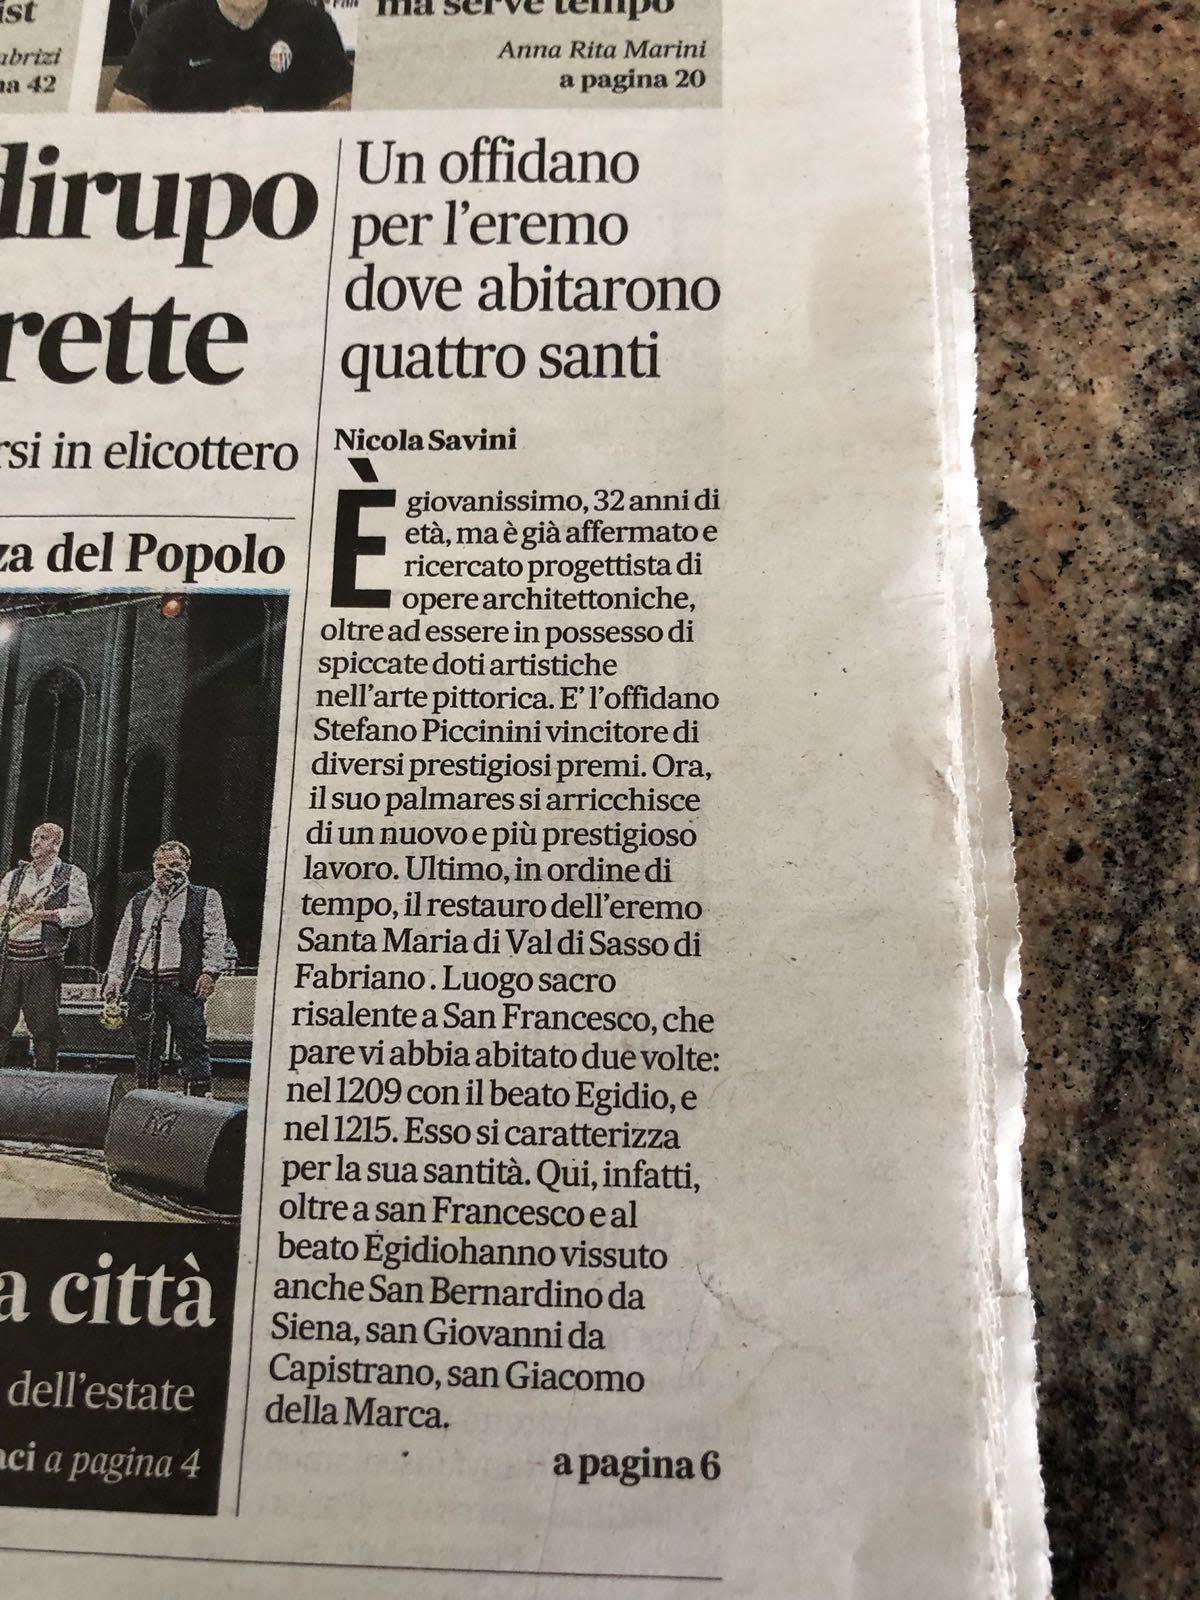 Corriere Adriatico 20-08-2018 1